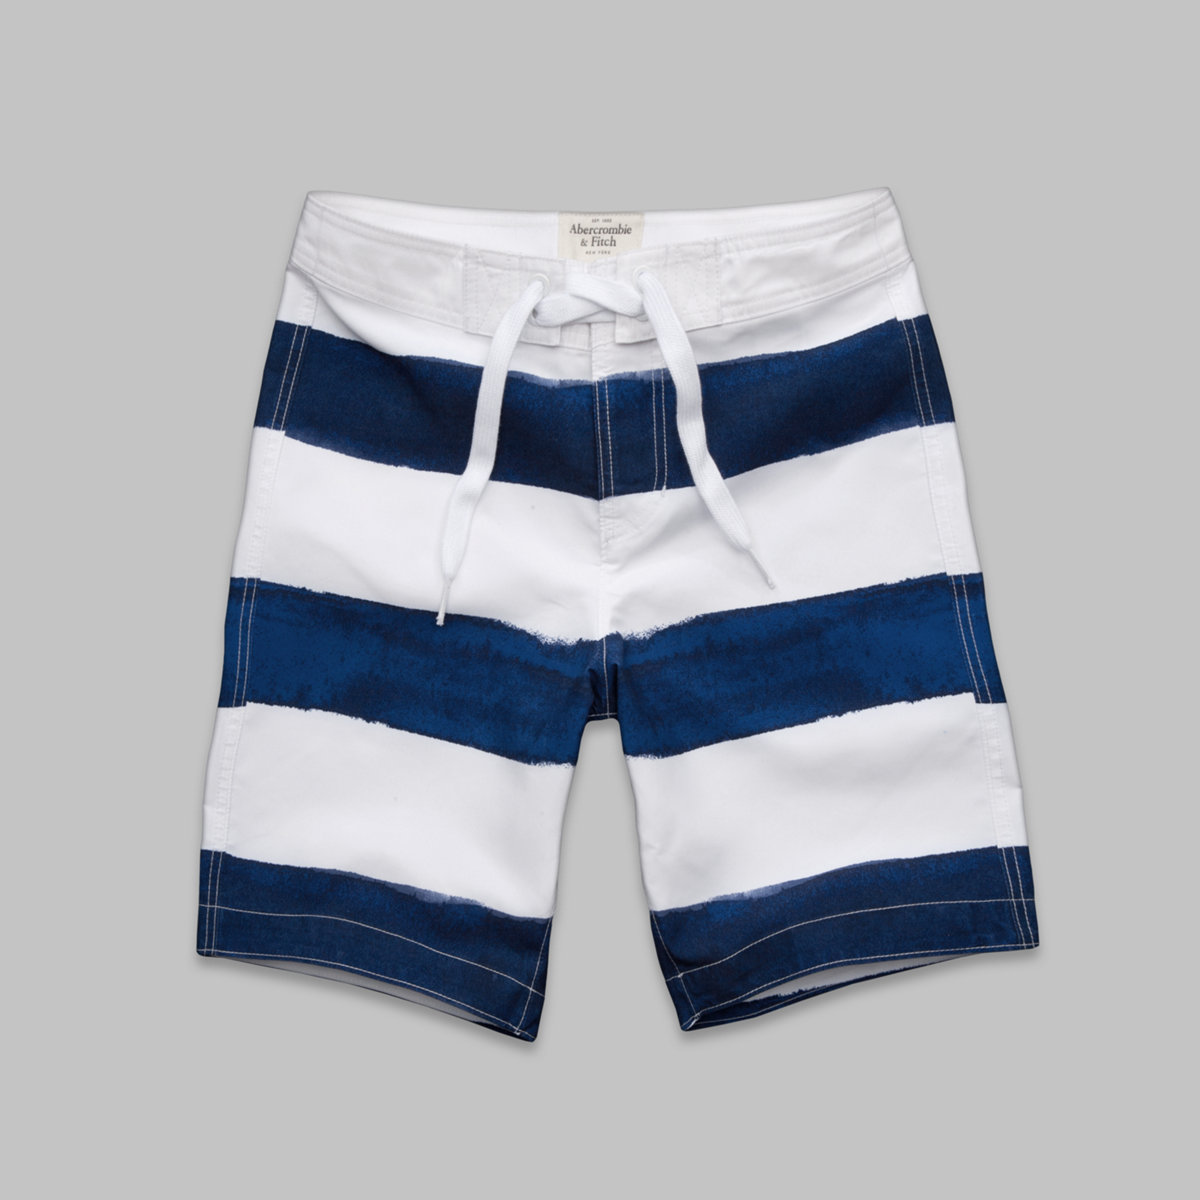 A&F Classic Fit Swim Shorts